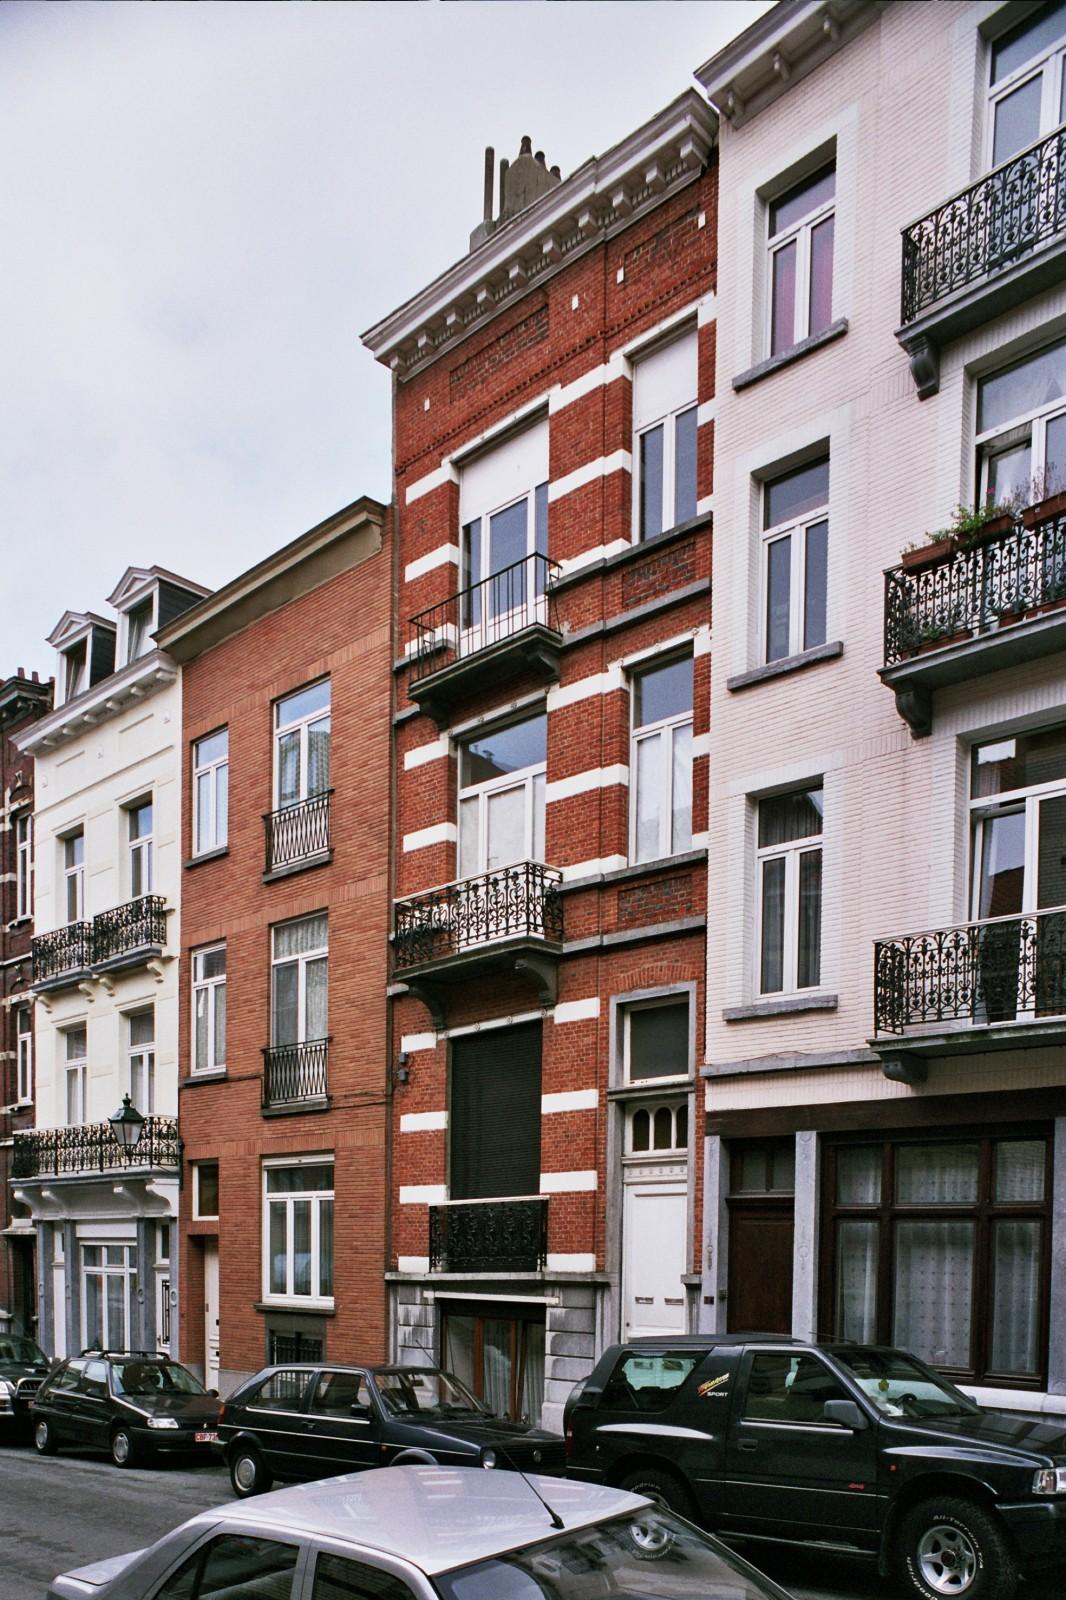 Rue de Loncin 12., 2004